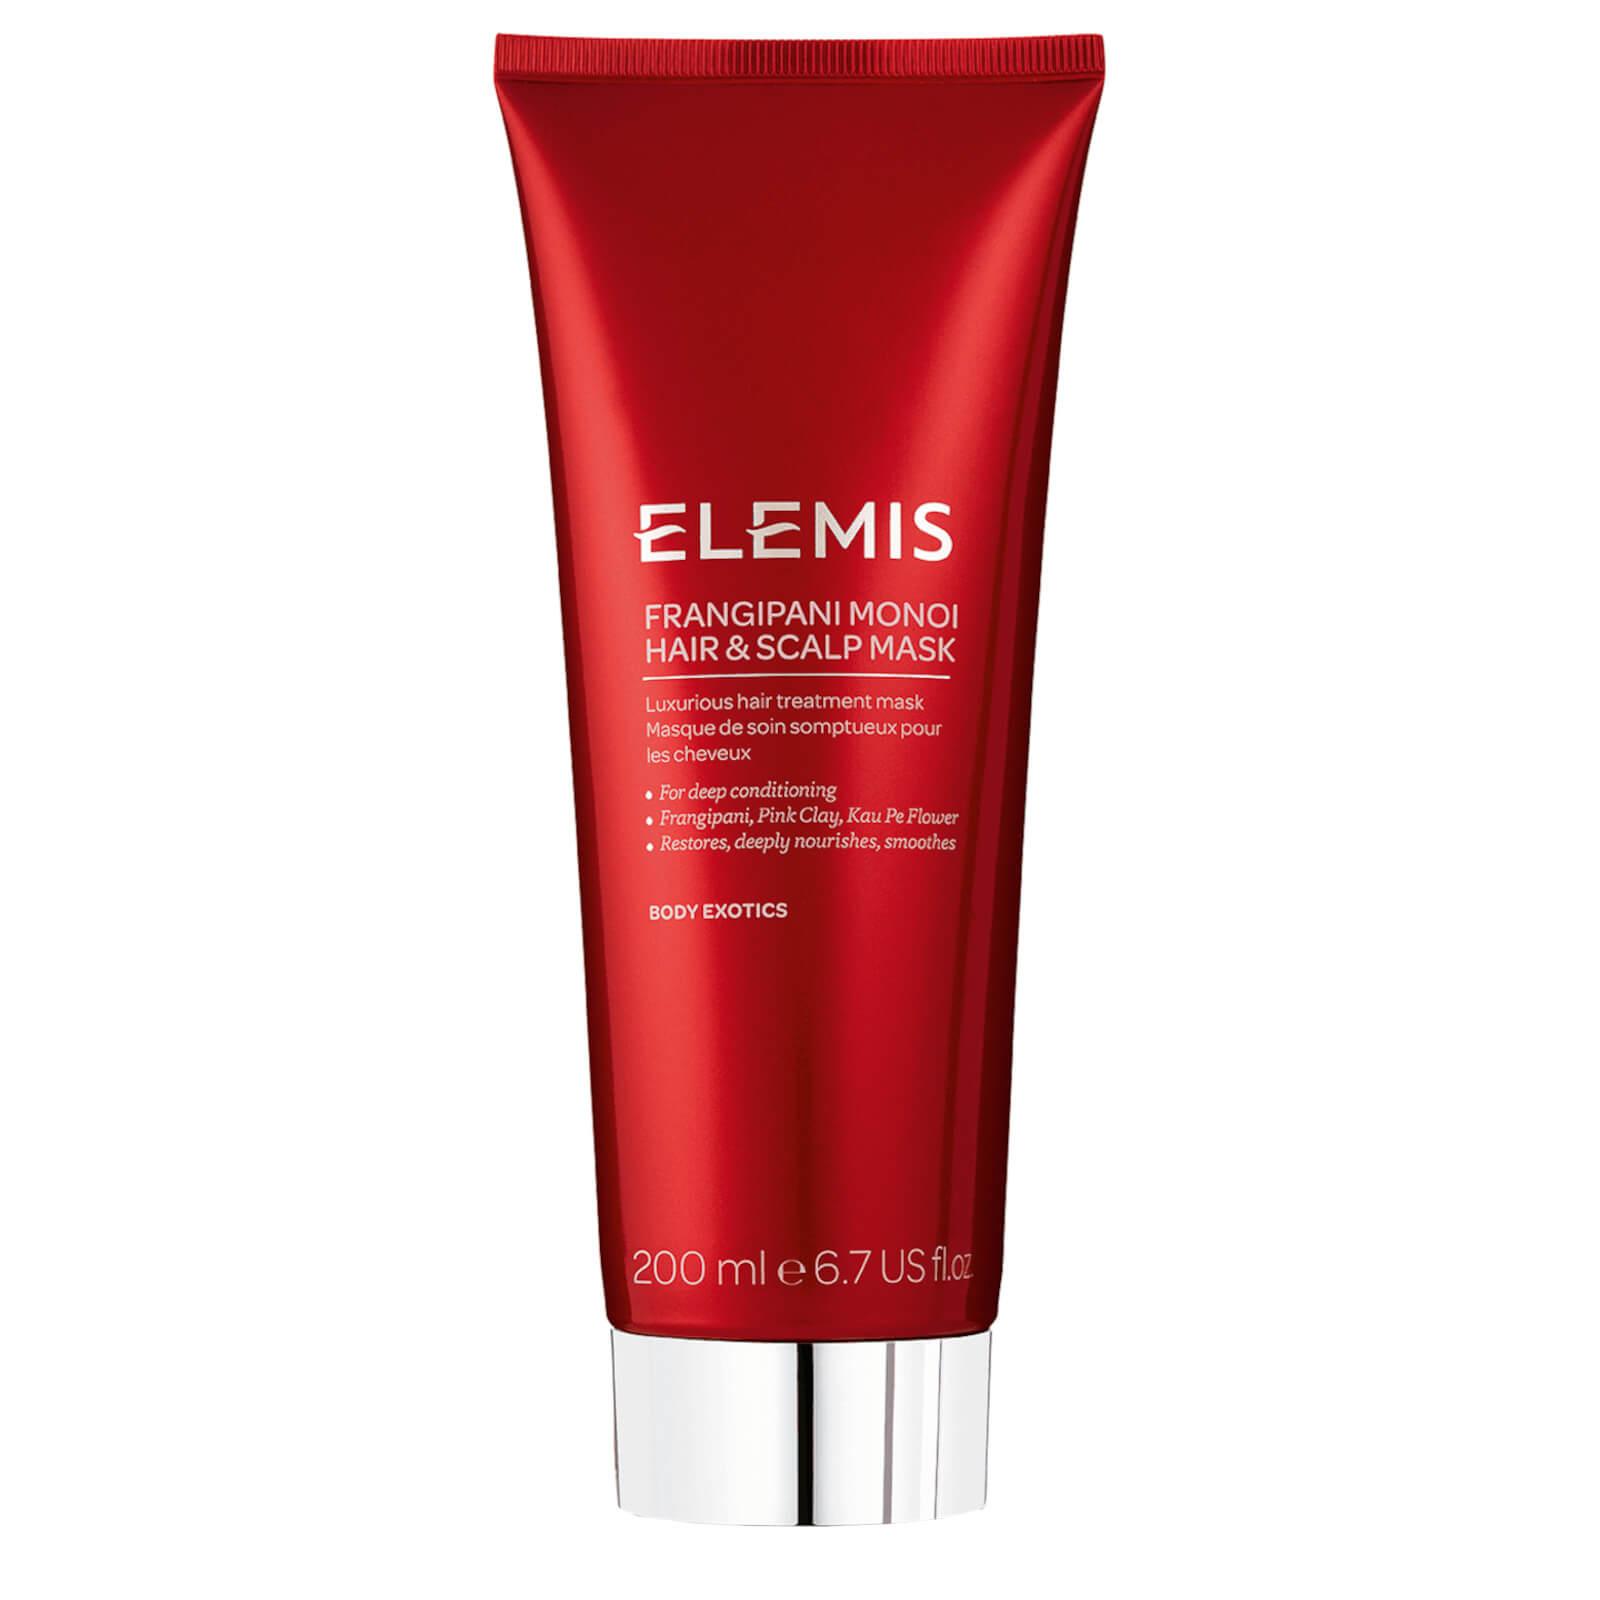 Купить Elemis Frangipani Monoi Hair and Scalp Mask